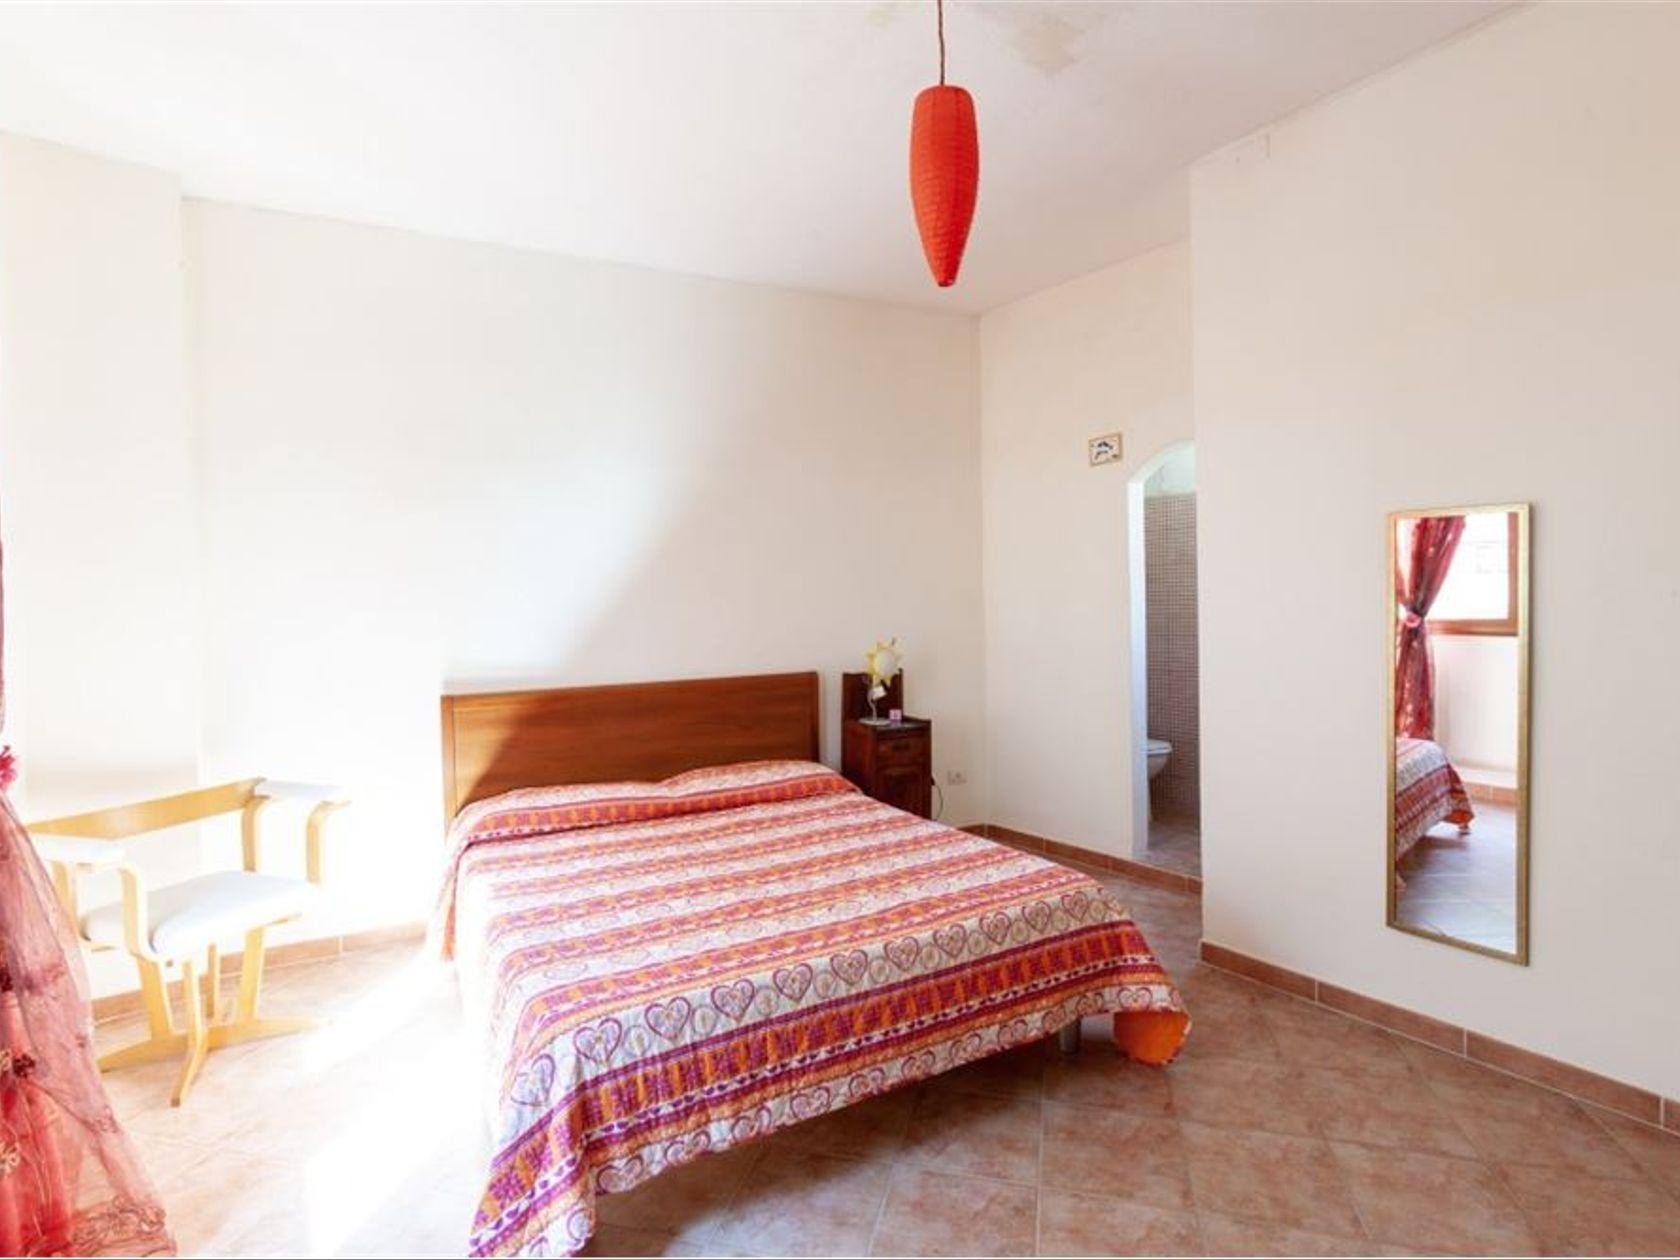 Appartamento Zona Centro, Quartu Sant'Elena, CA Vendita - Foto 5